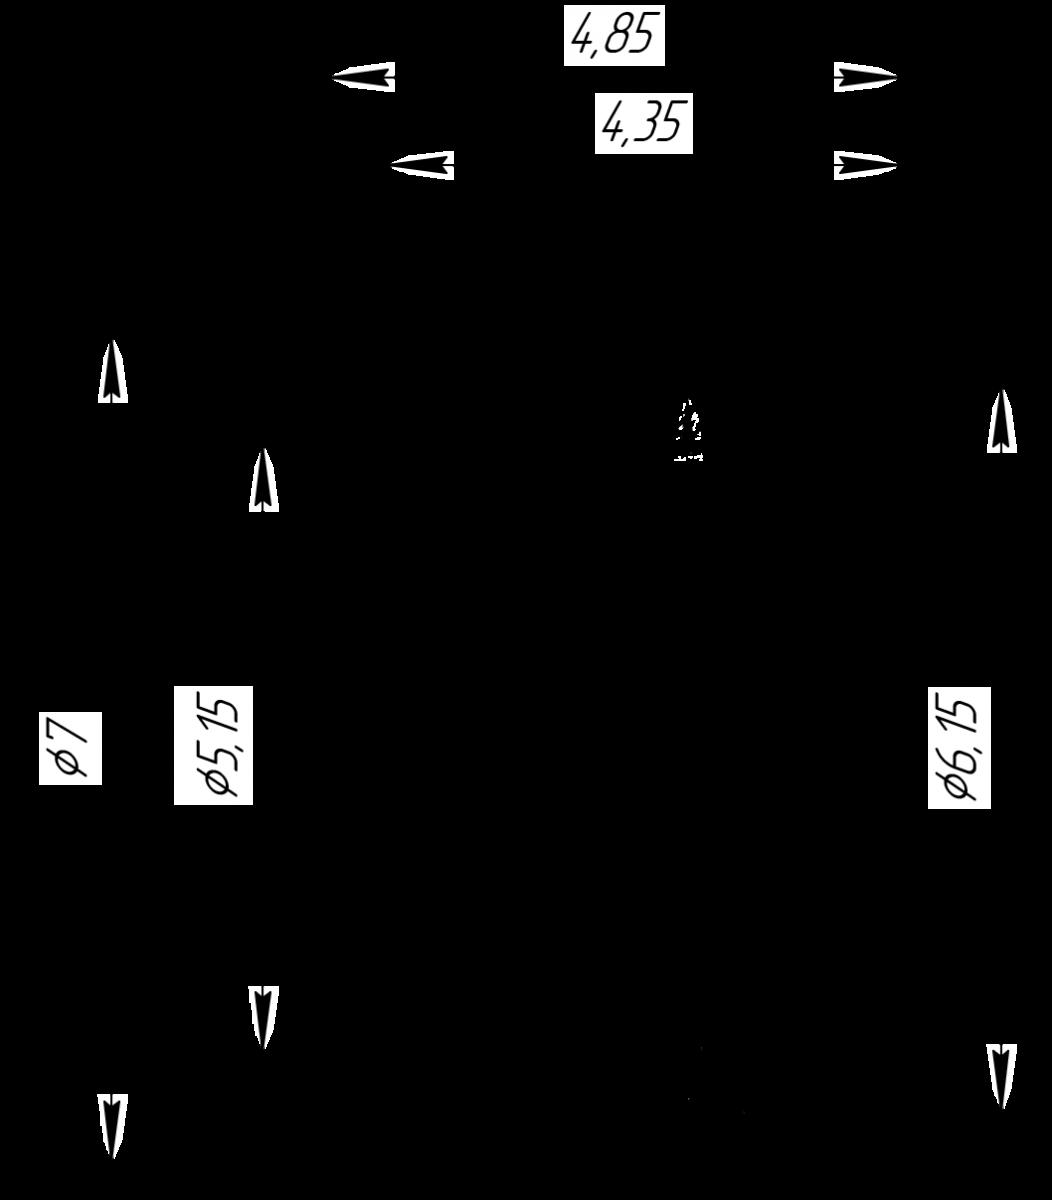 Втулка для полного протокола Ø5.1